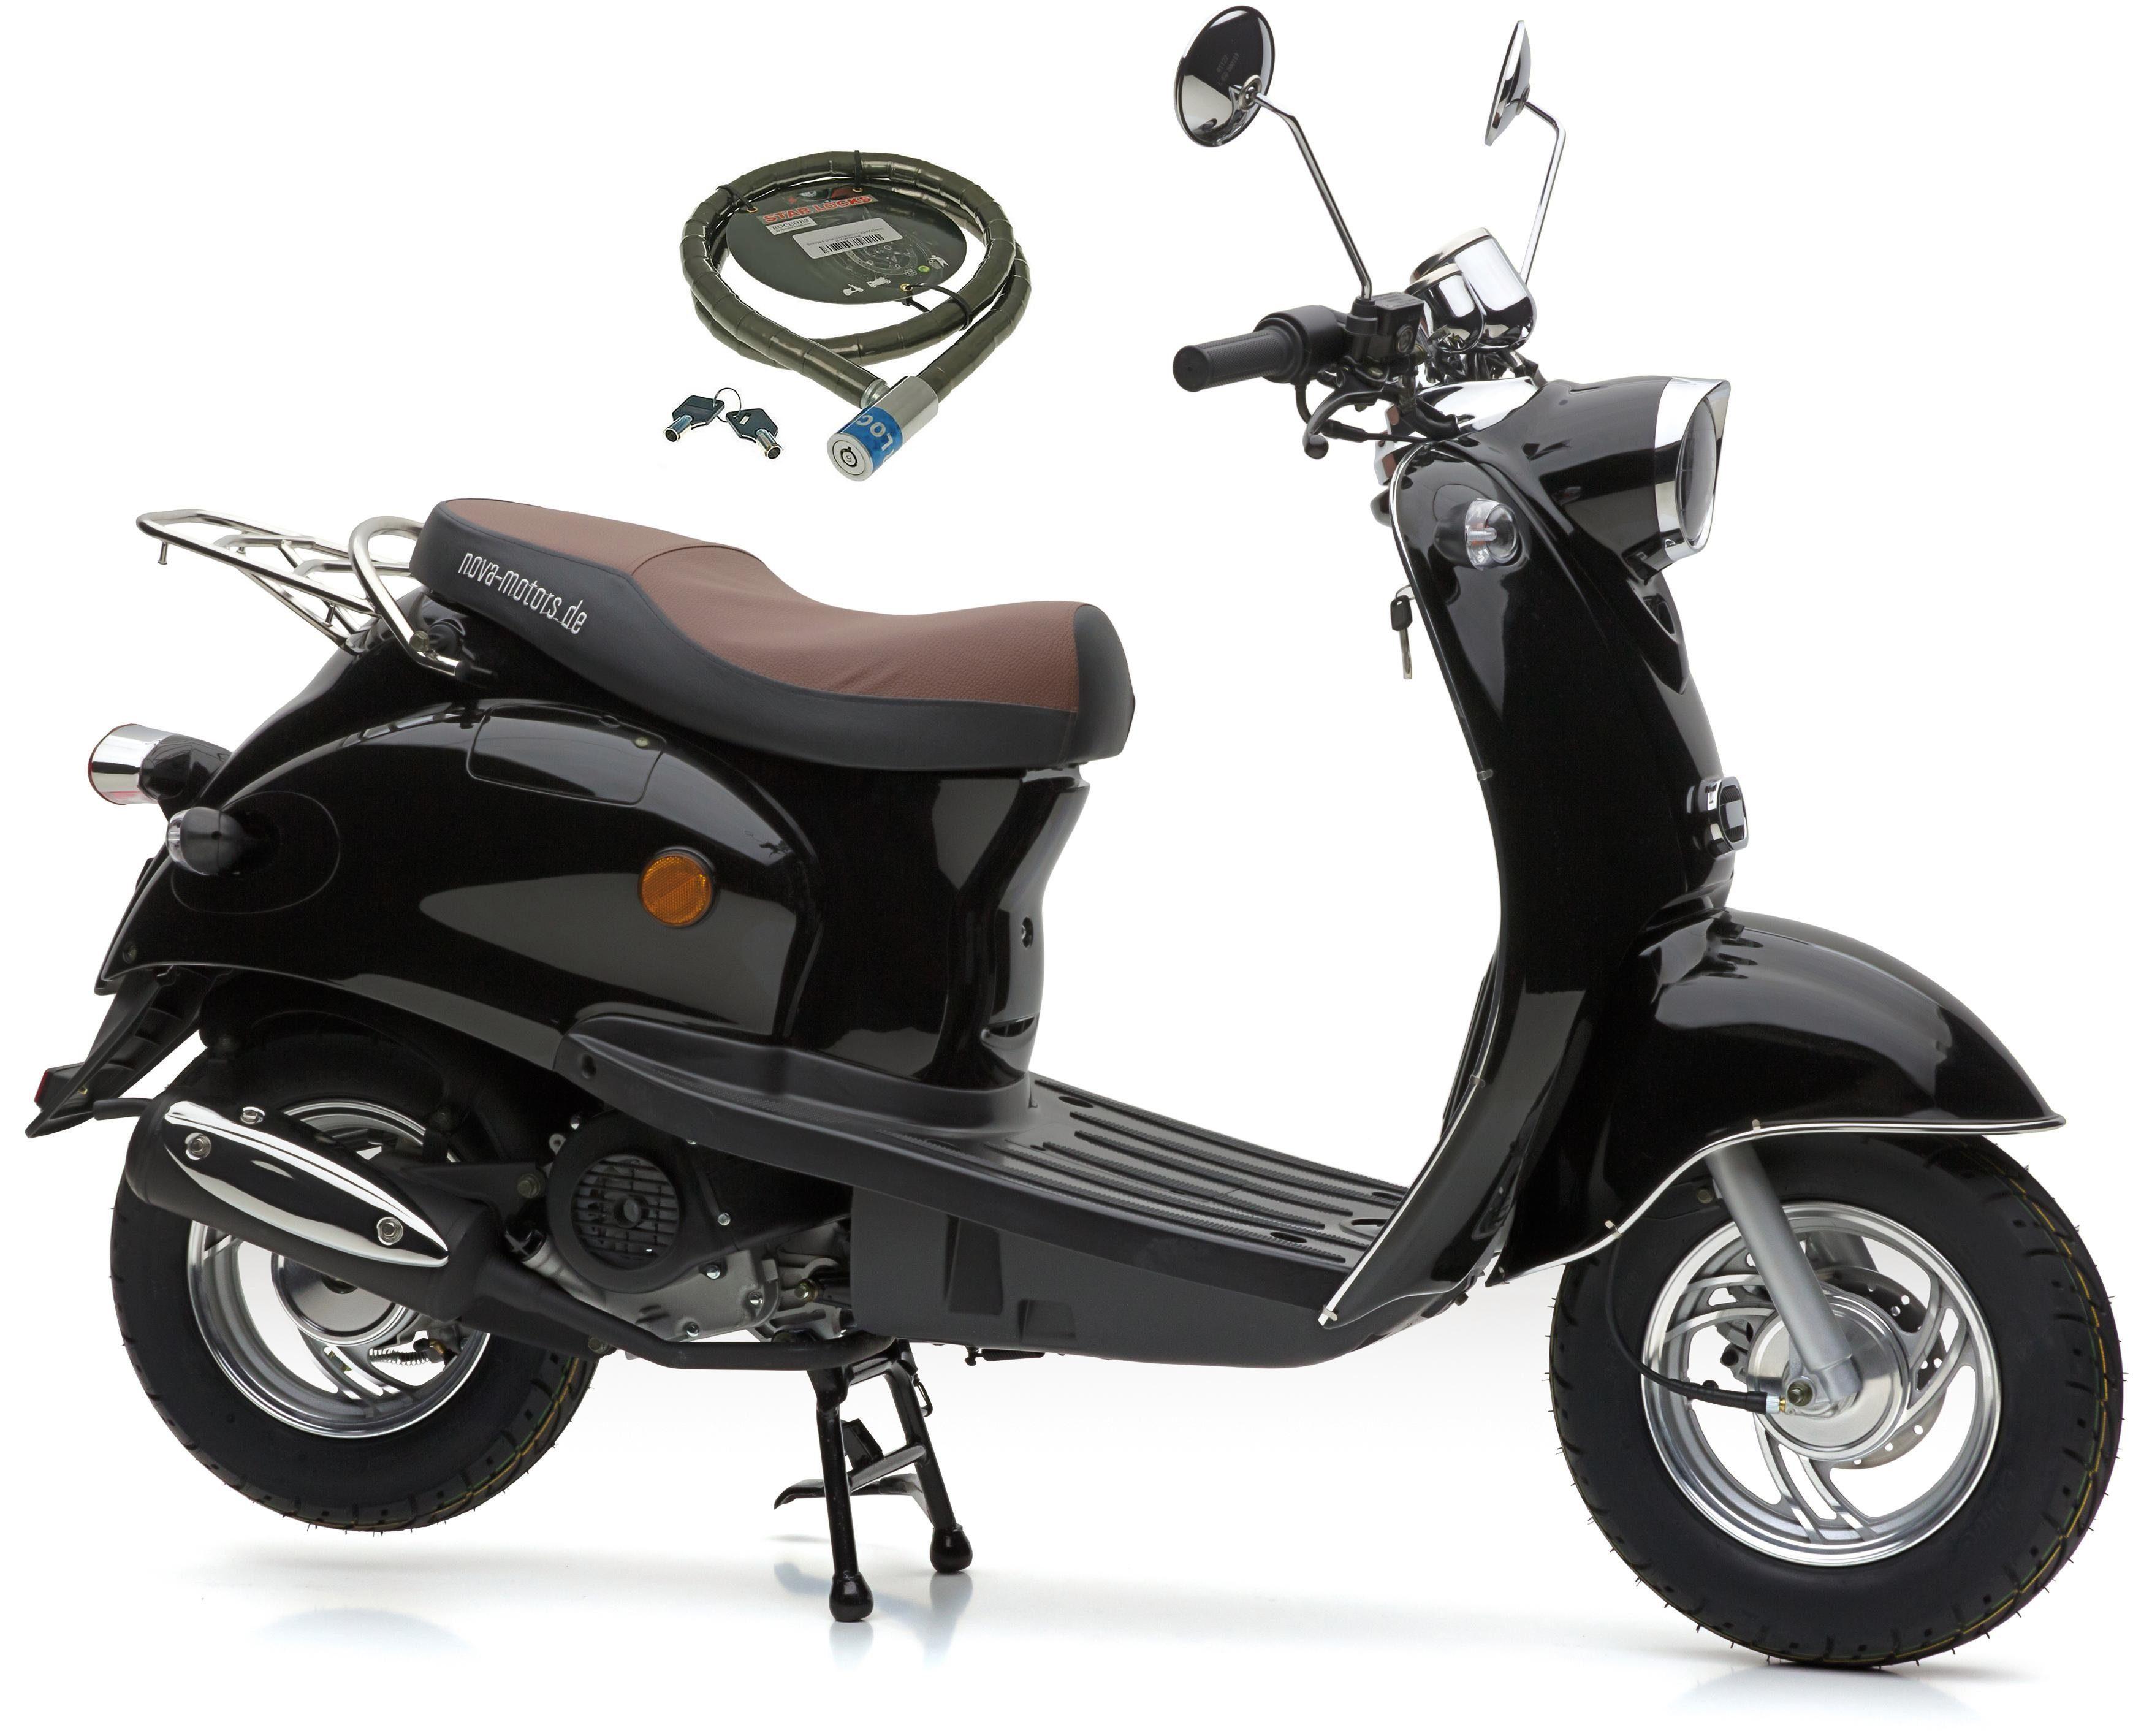 Nova Motors Motorroller »Retro Star«, 49 ccm, 45 km/h, Euro 4, 49 ccm, 45 km/h